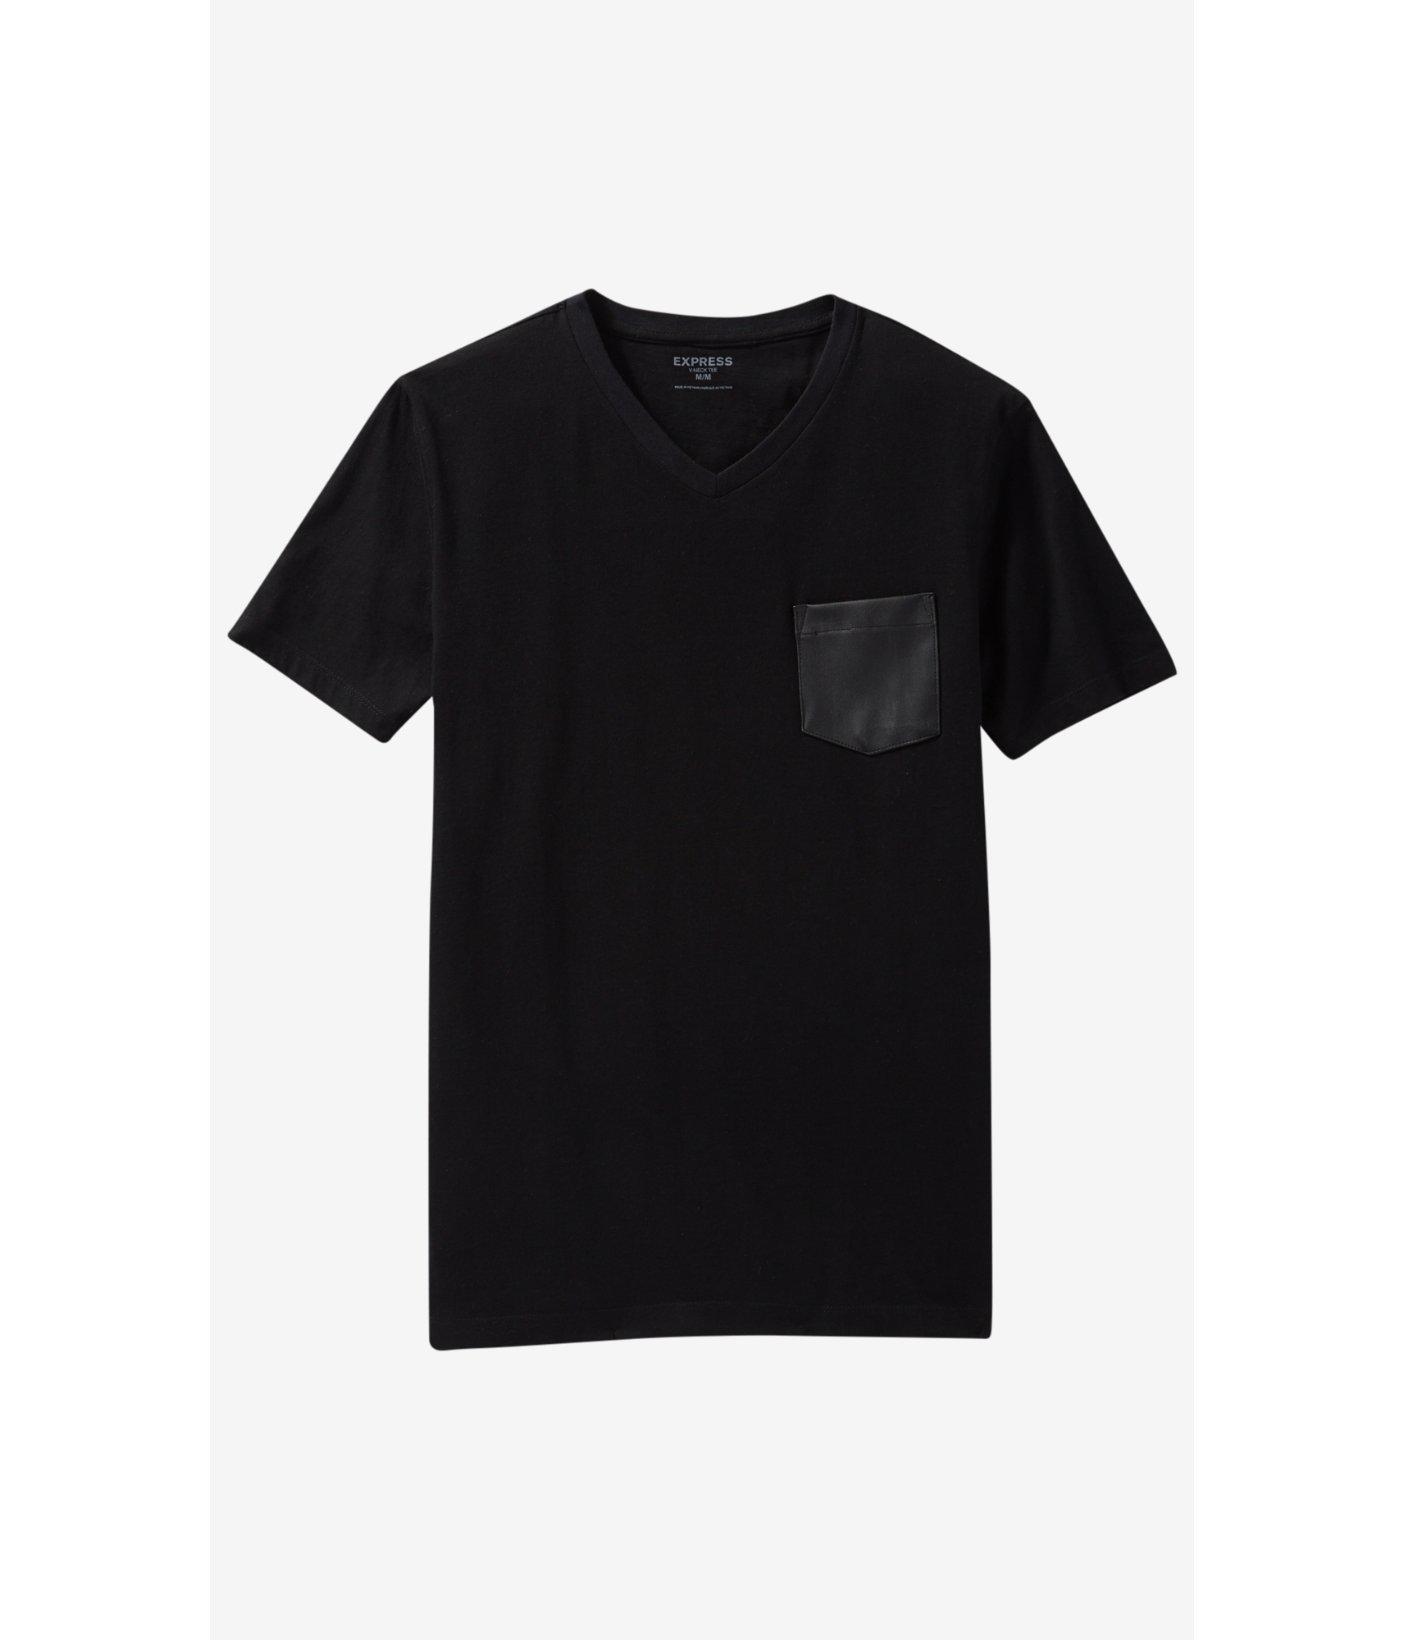 White t shirt express - Black T Shirt Express Express Black V Neck Minus The Leather Pocket T Shirt In